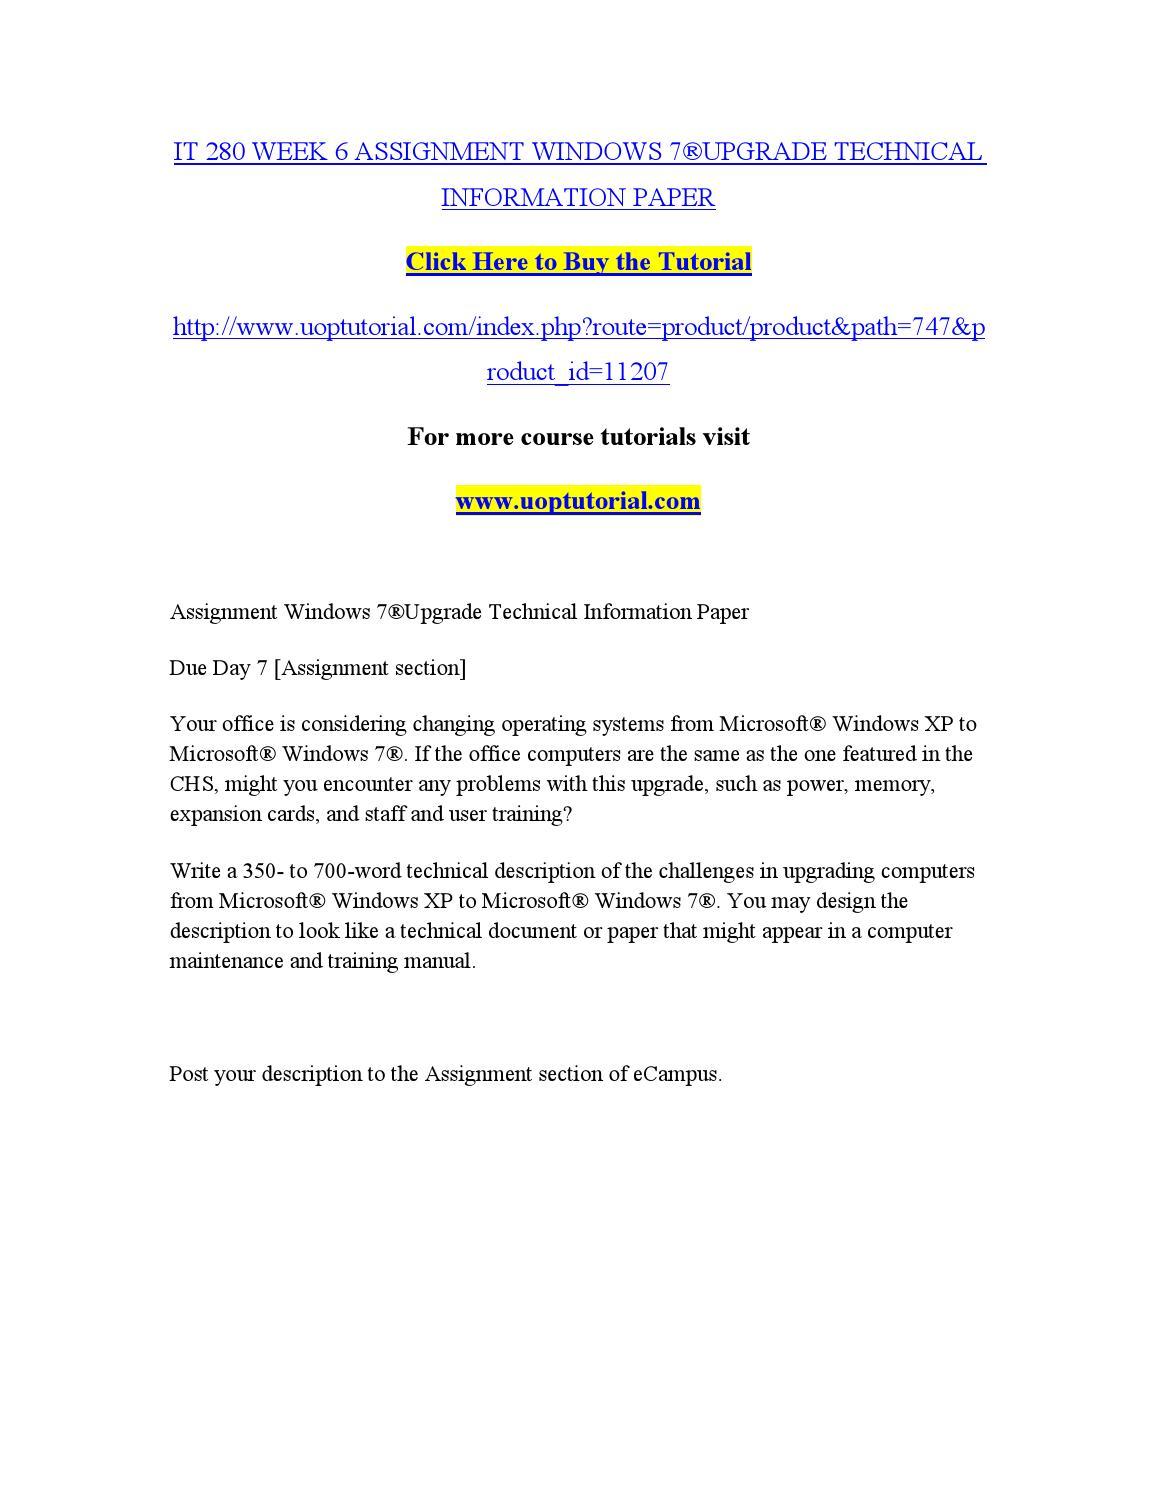 It 280 week 6 assignment windows 7®upgrade technical